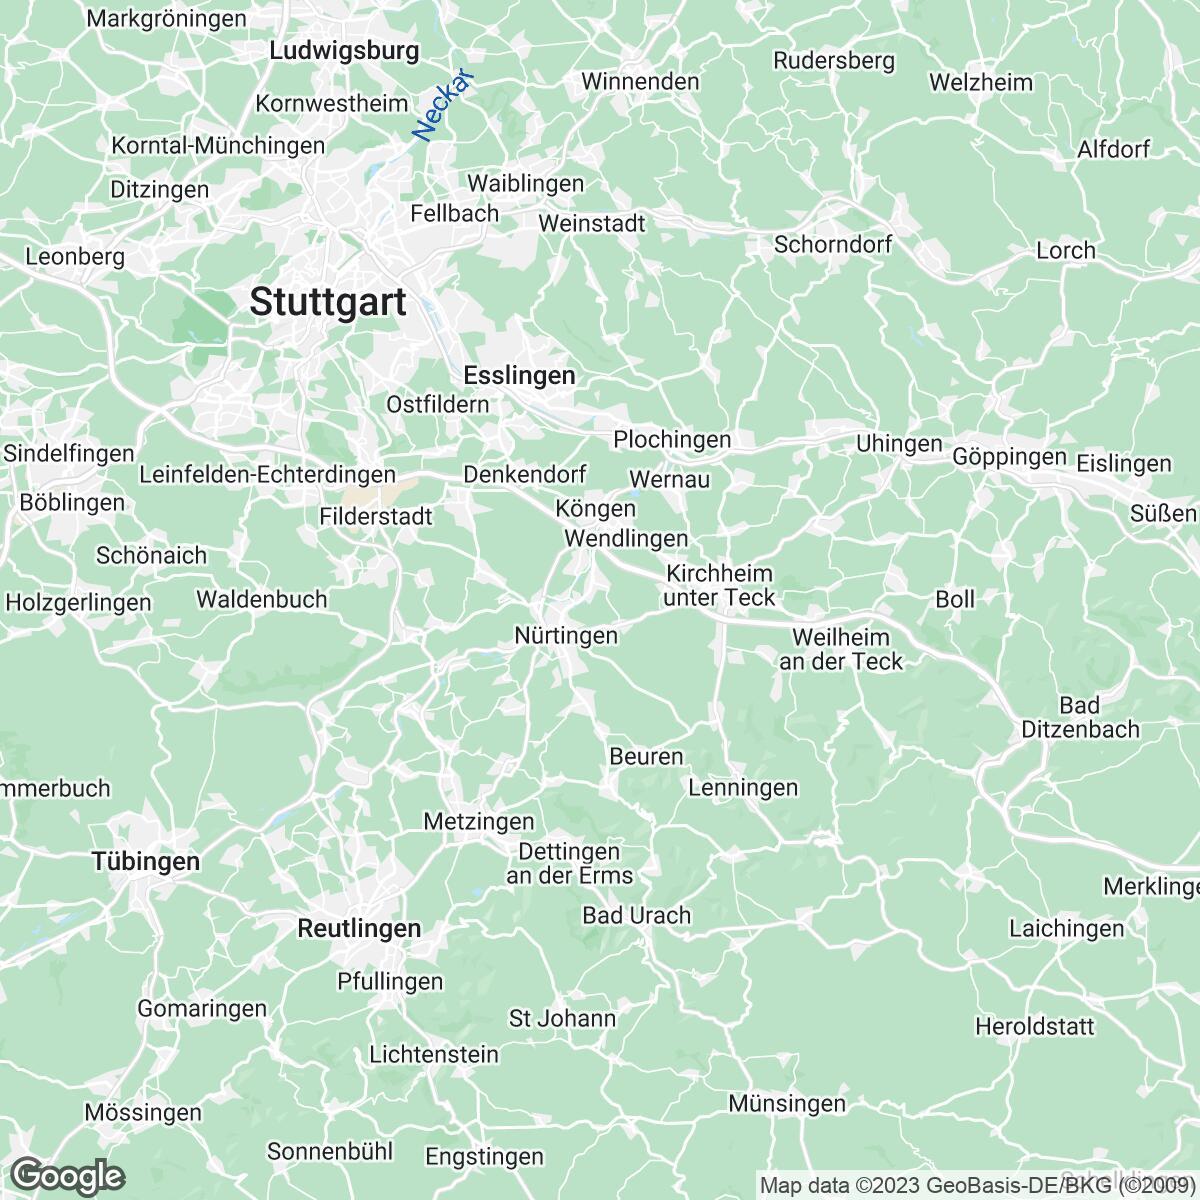 Verkaufsgebiet der Zeitungen Nürtinger Zeitung/Wendlinger Zeitung